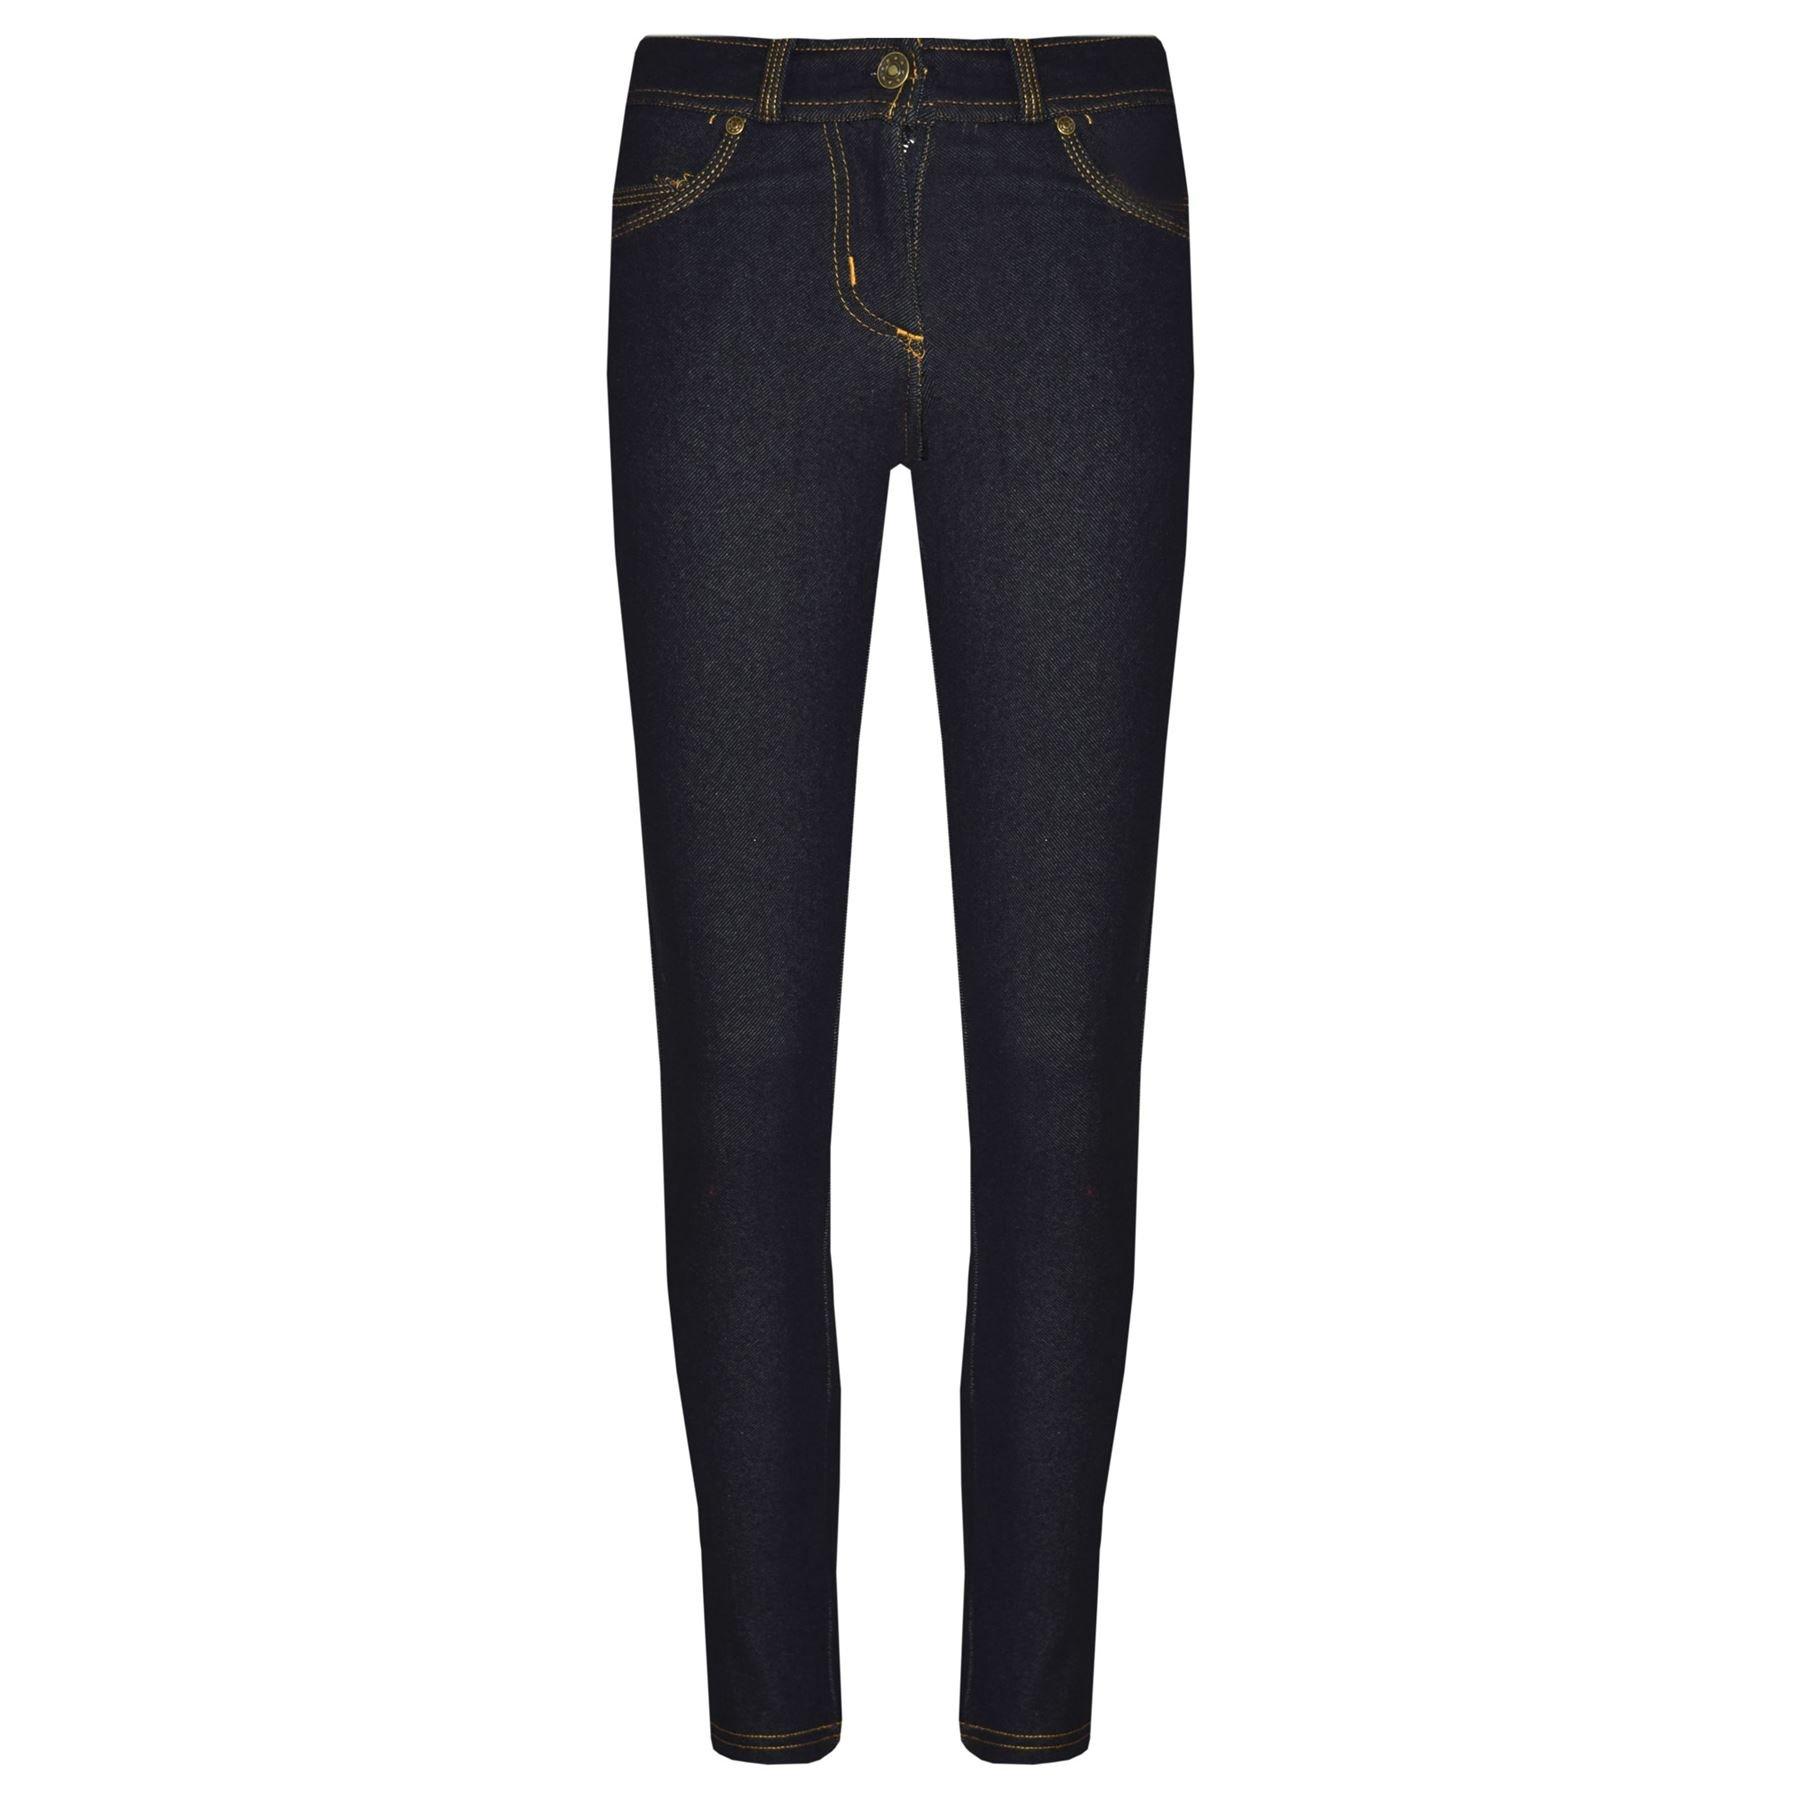 A2Z 4 Kids® Girls Skinny Jeans Kids Black Stretchy Denim Jeggings Fit Pants Trousers 5-13 Yr